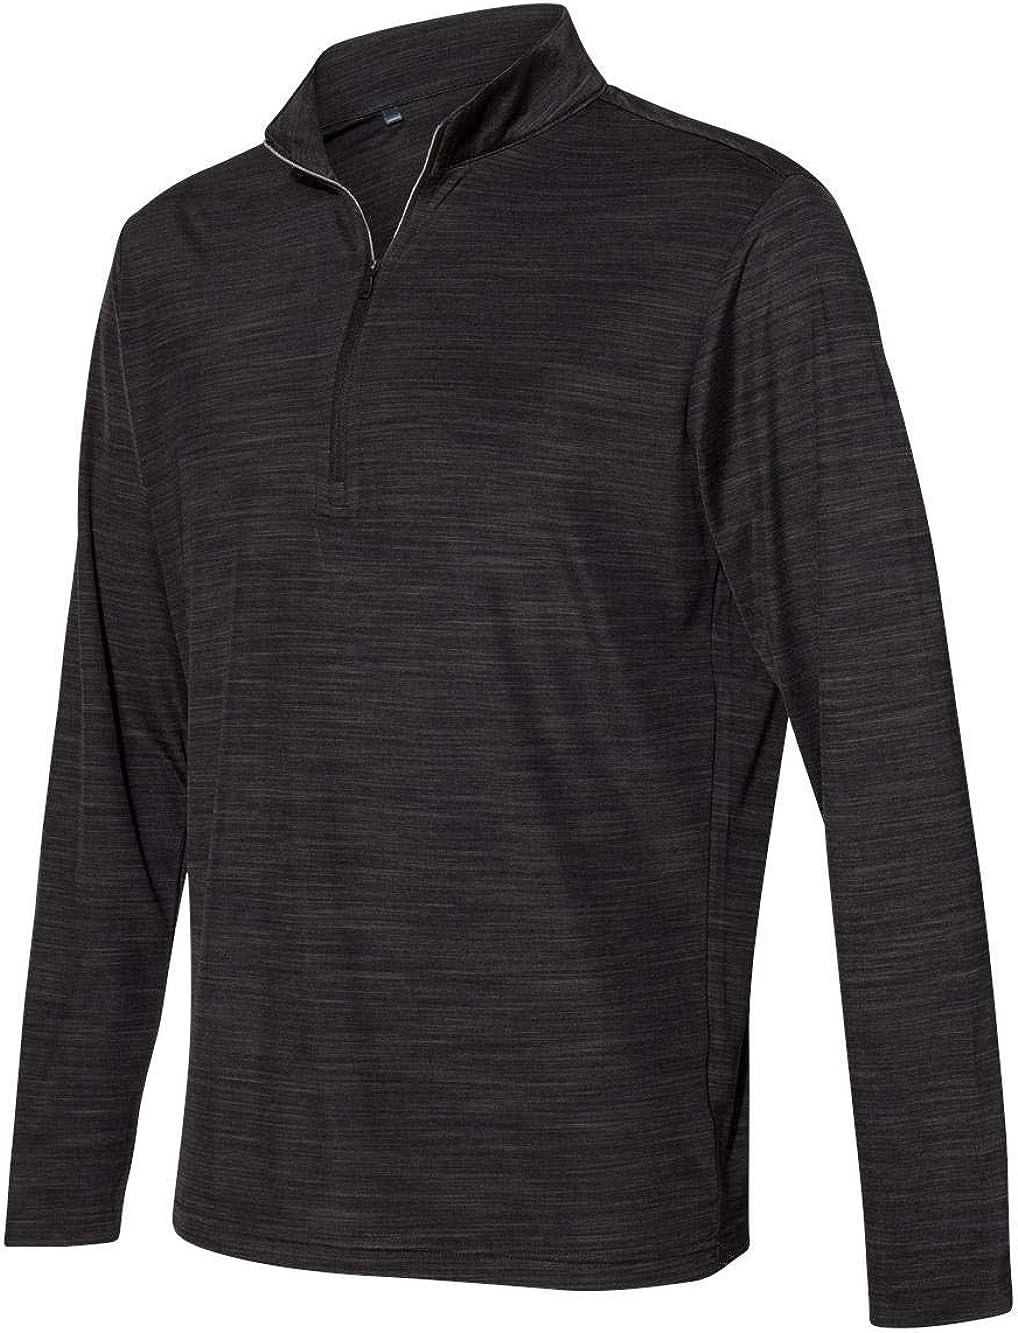 adidas Mens Lightweight Melange 市販 Quarter-Zip Pullover A475 -Bla 70%OFFアウトレット